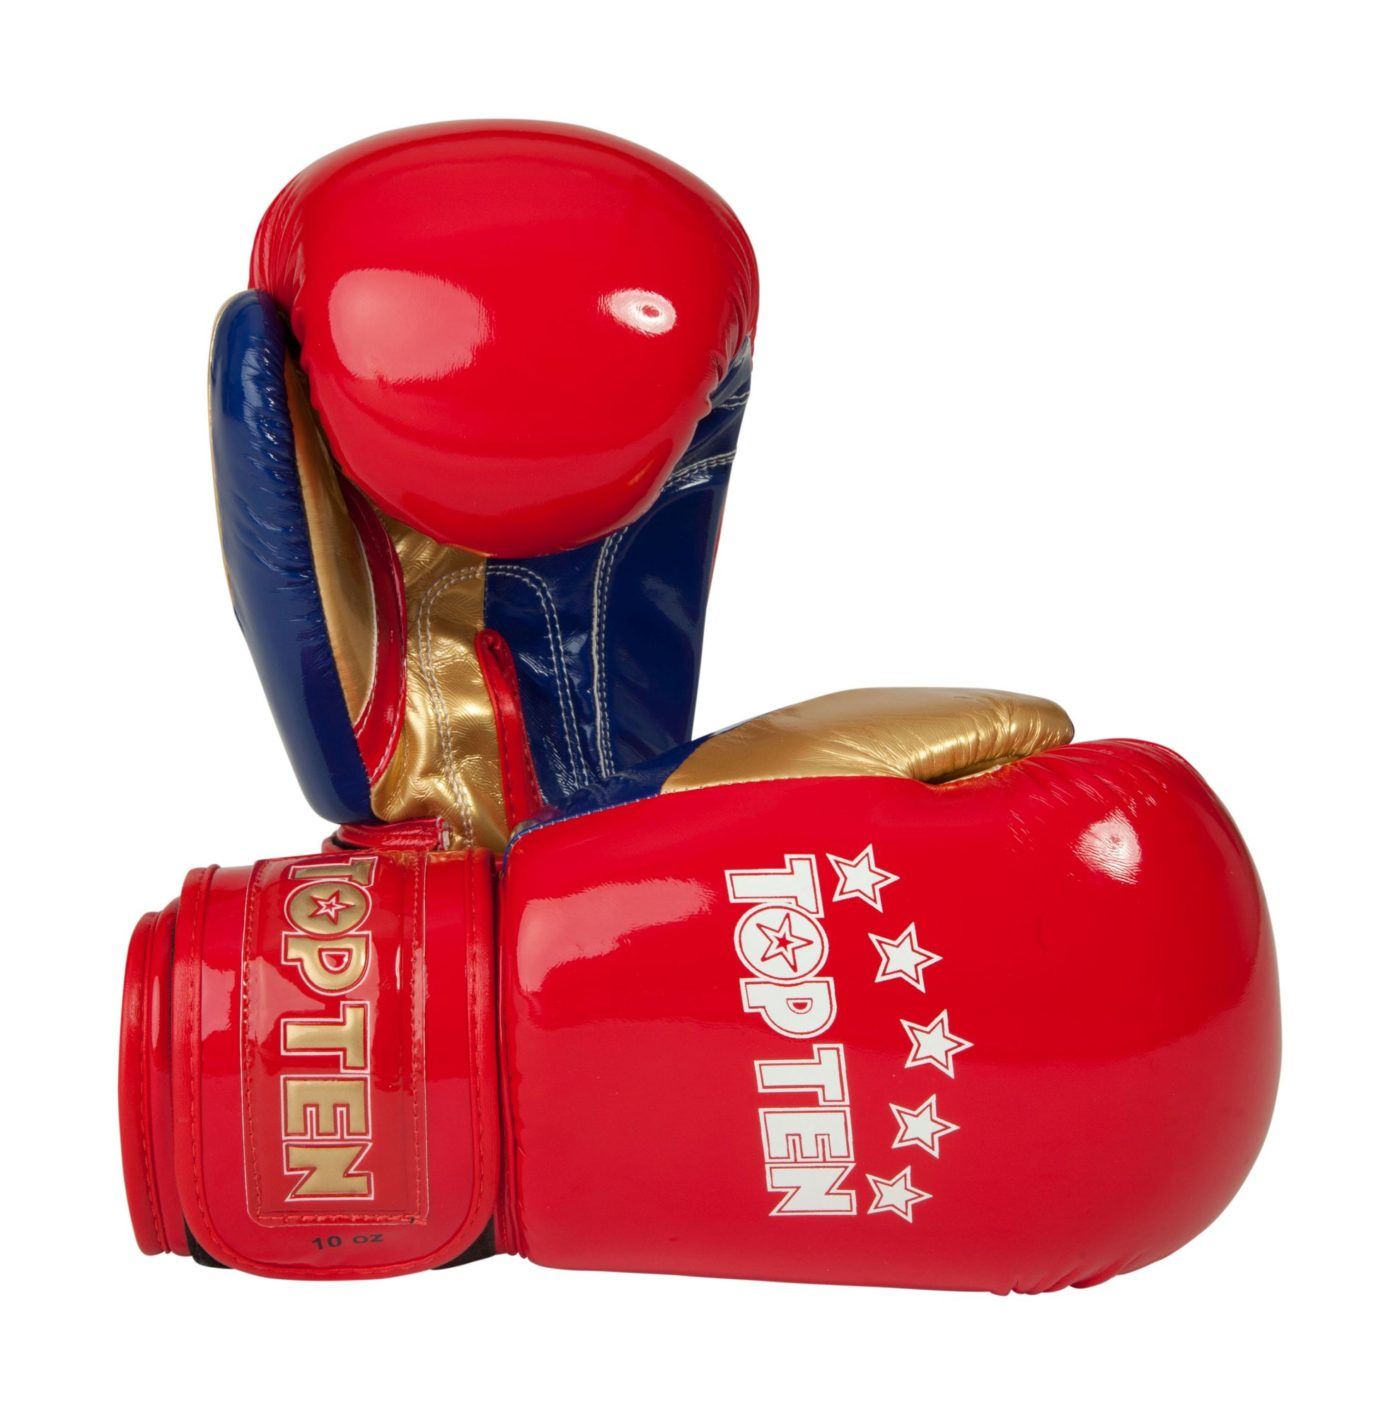 "Bokshandschoenen ""Champion"" in glossy look Rood - goud"